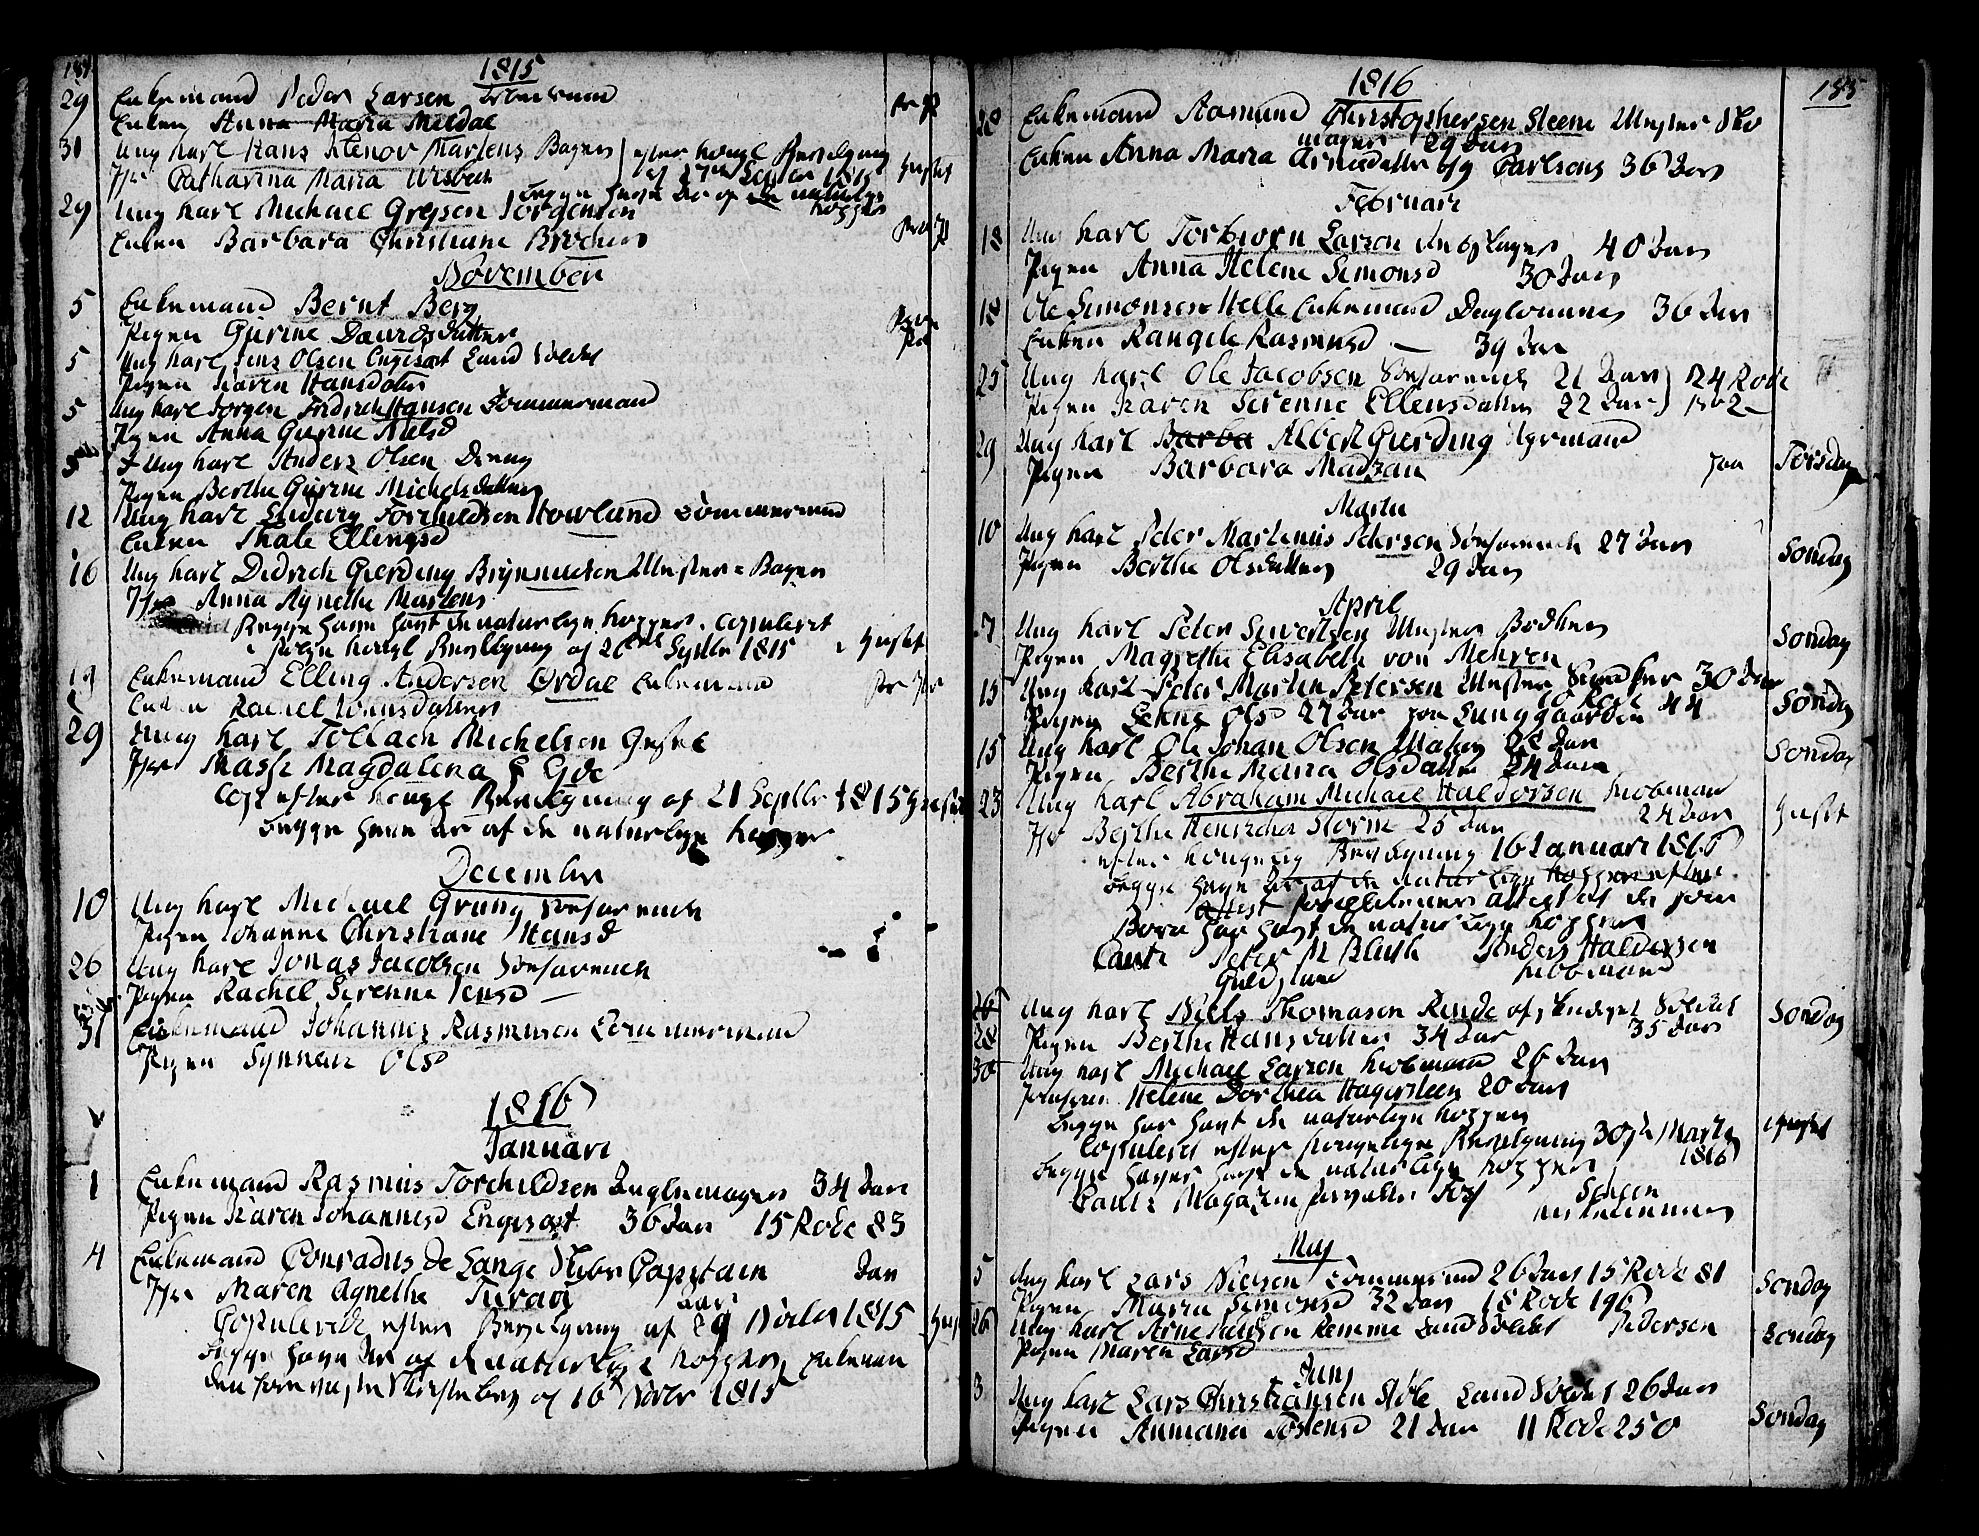 SAB, Domkirken Sokneprestembete, H/Haa/L0007: Ministerialbok nr. A 7, 1725-1826, s. 184-185